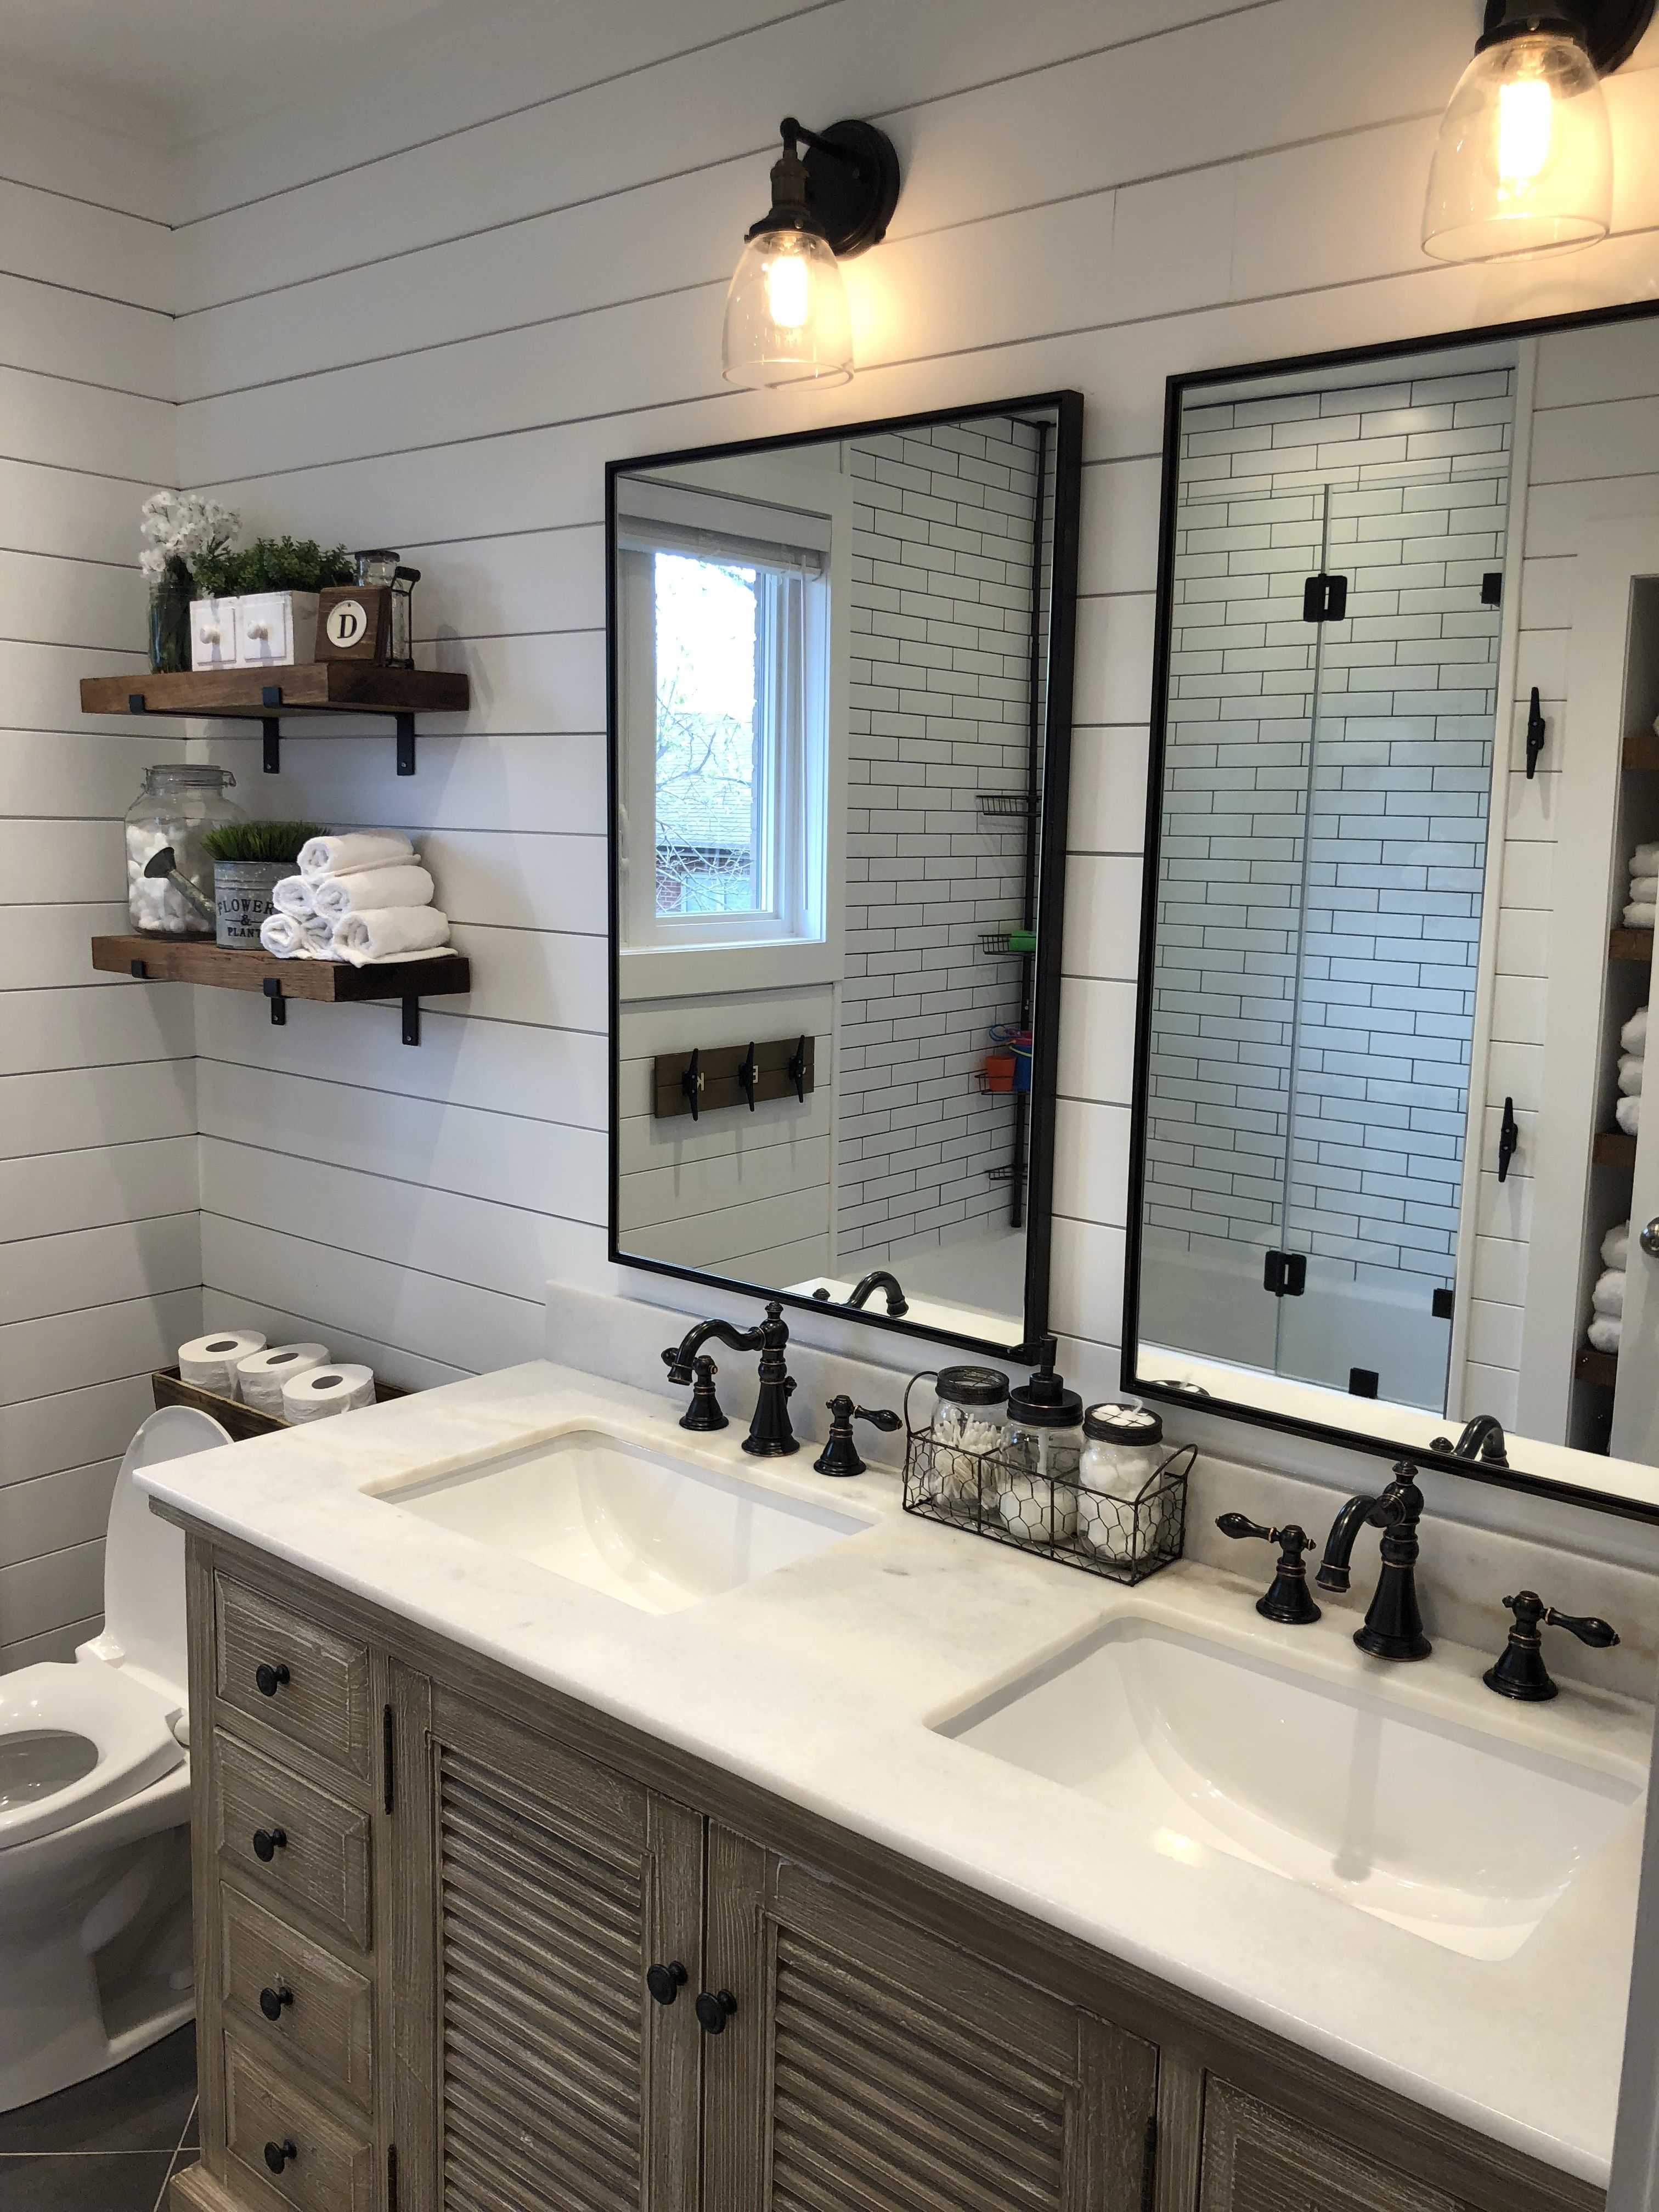 Wooden Towel Shelf Under Basin Vanity Shelves Vanity Basin